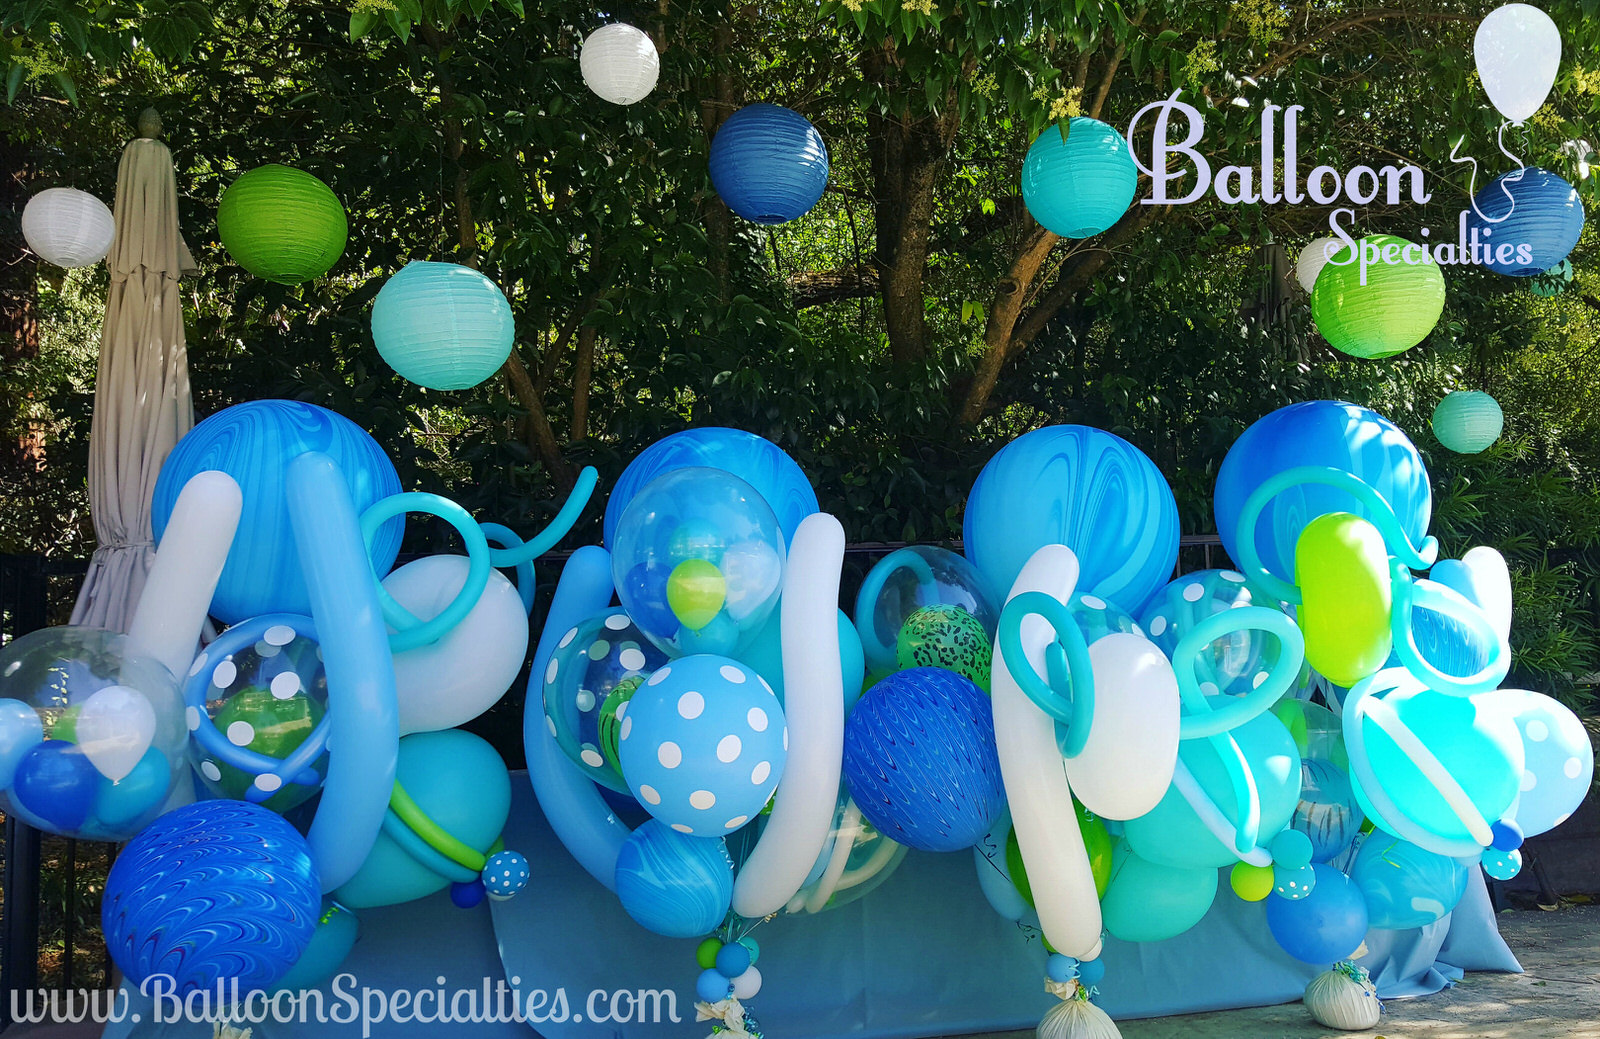 Fairmont Sonoma Specialty Balloon Bouquets Beach Theme Zim Balloon Specialties.jpg